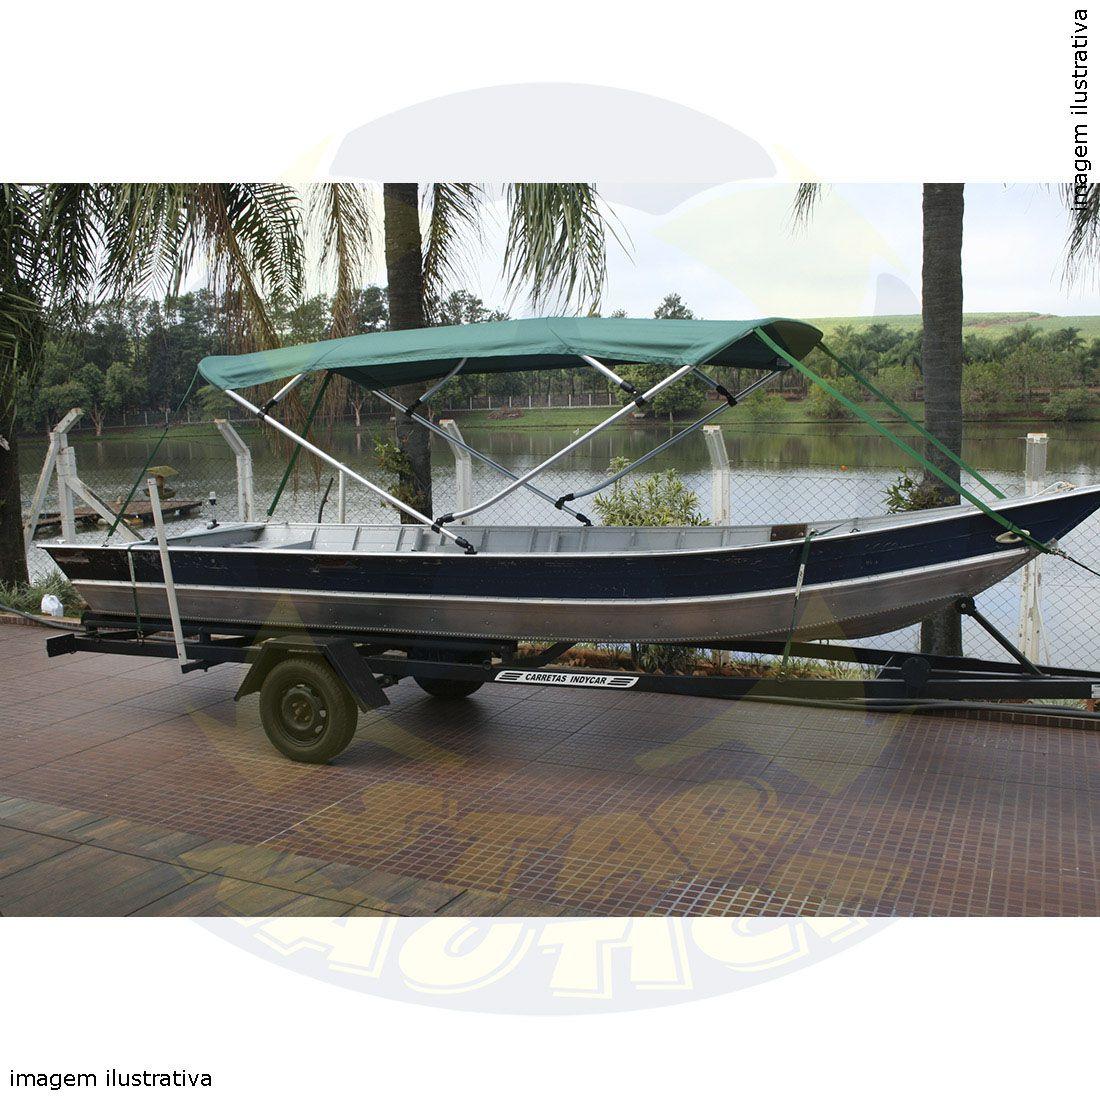 Capota Toldo Barco Big Fish 5014 Poliéster 4 Arcos Tubo 1 1/4